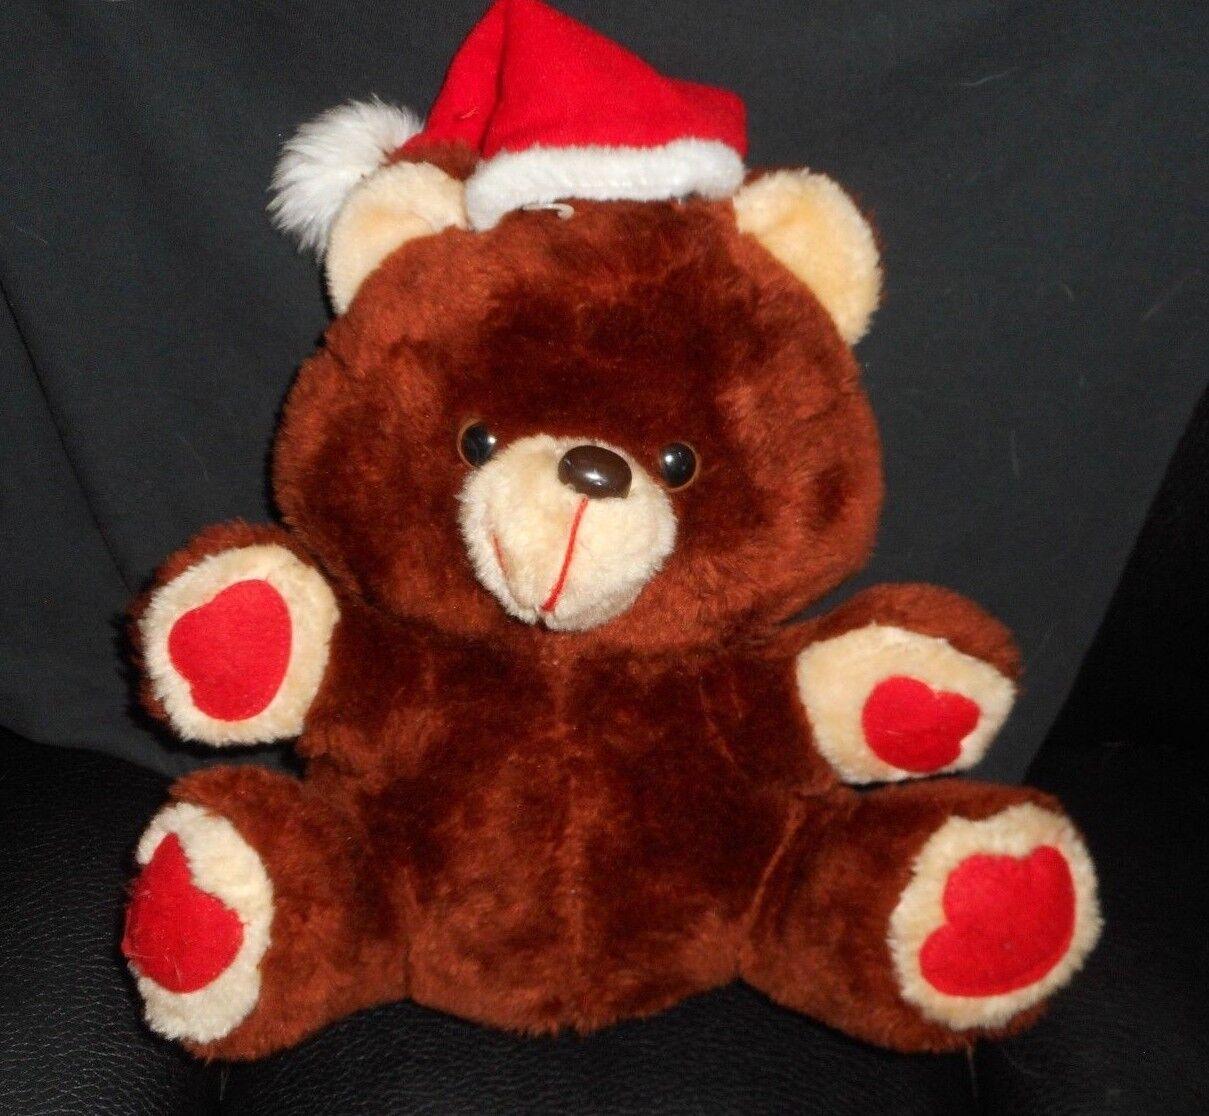 VINTAGE MTY CHRISTMAS ELECTRONIC MUSICAL TEDDY BEAR STUFFED ANIMAL PLUSH WORKS